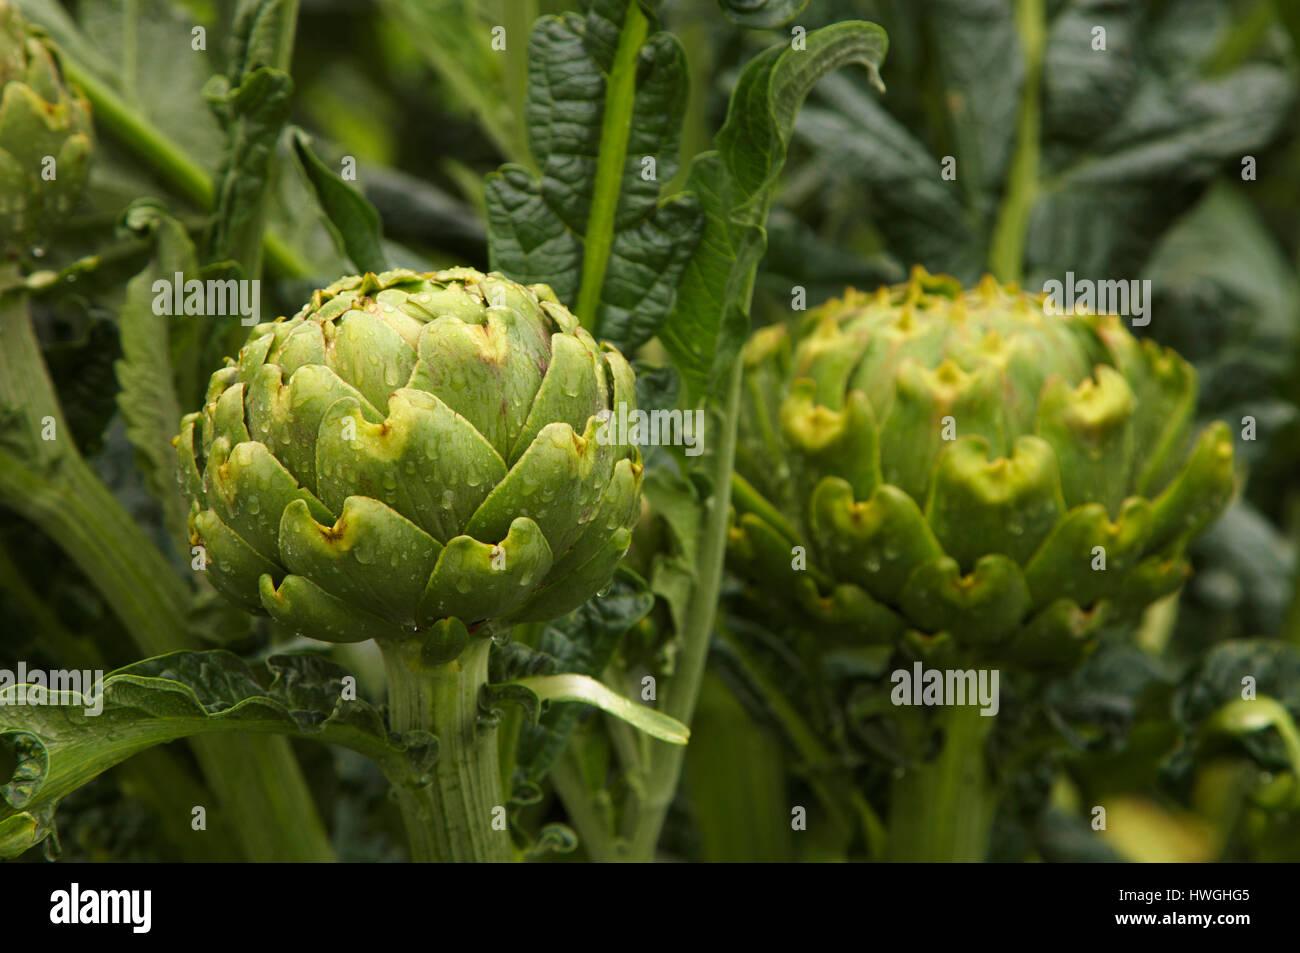 glänzend grüne Artischocken wachsen in Vegatable Patch Cynara cardunculus Stockbild